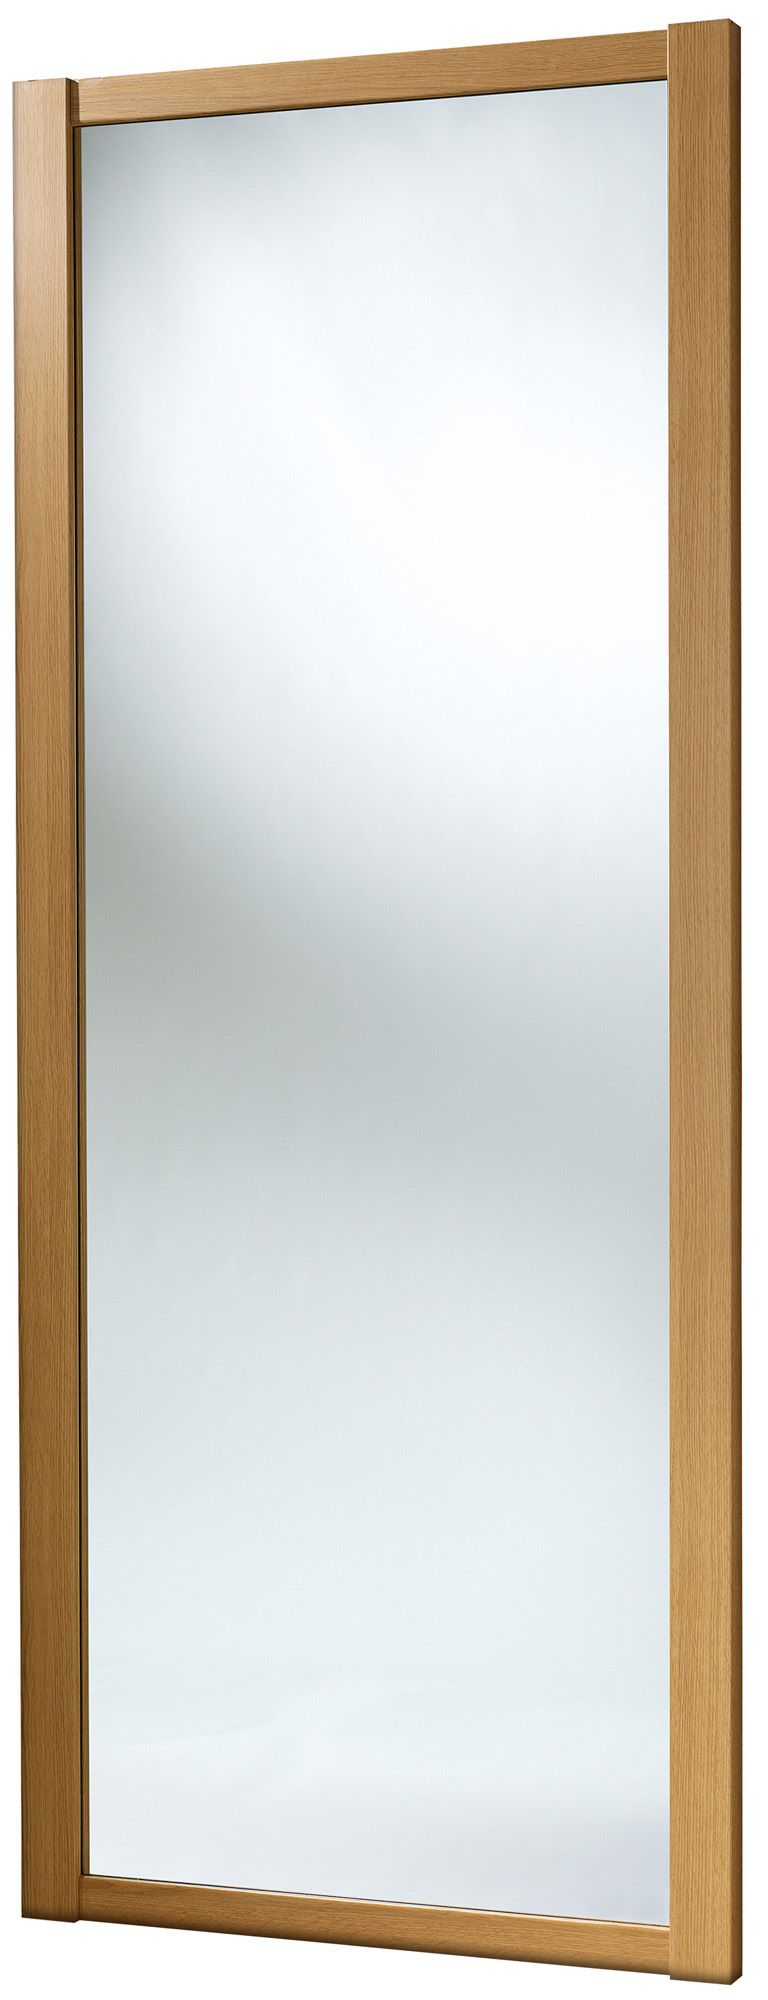 Shaker Mirrored Natural Traditional Oak Effect Sliding Wardrobe Door (h)2220 Mm (w)762mm